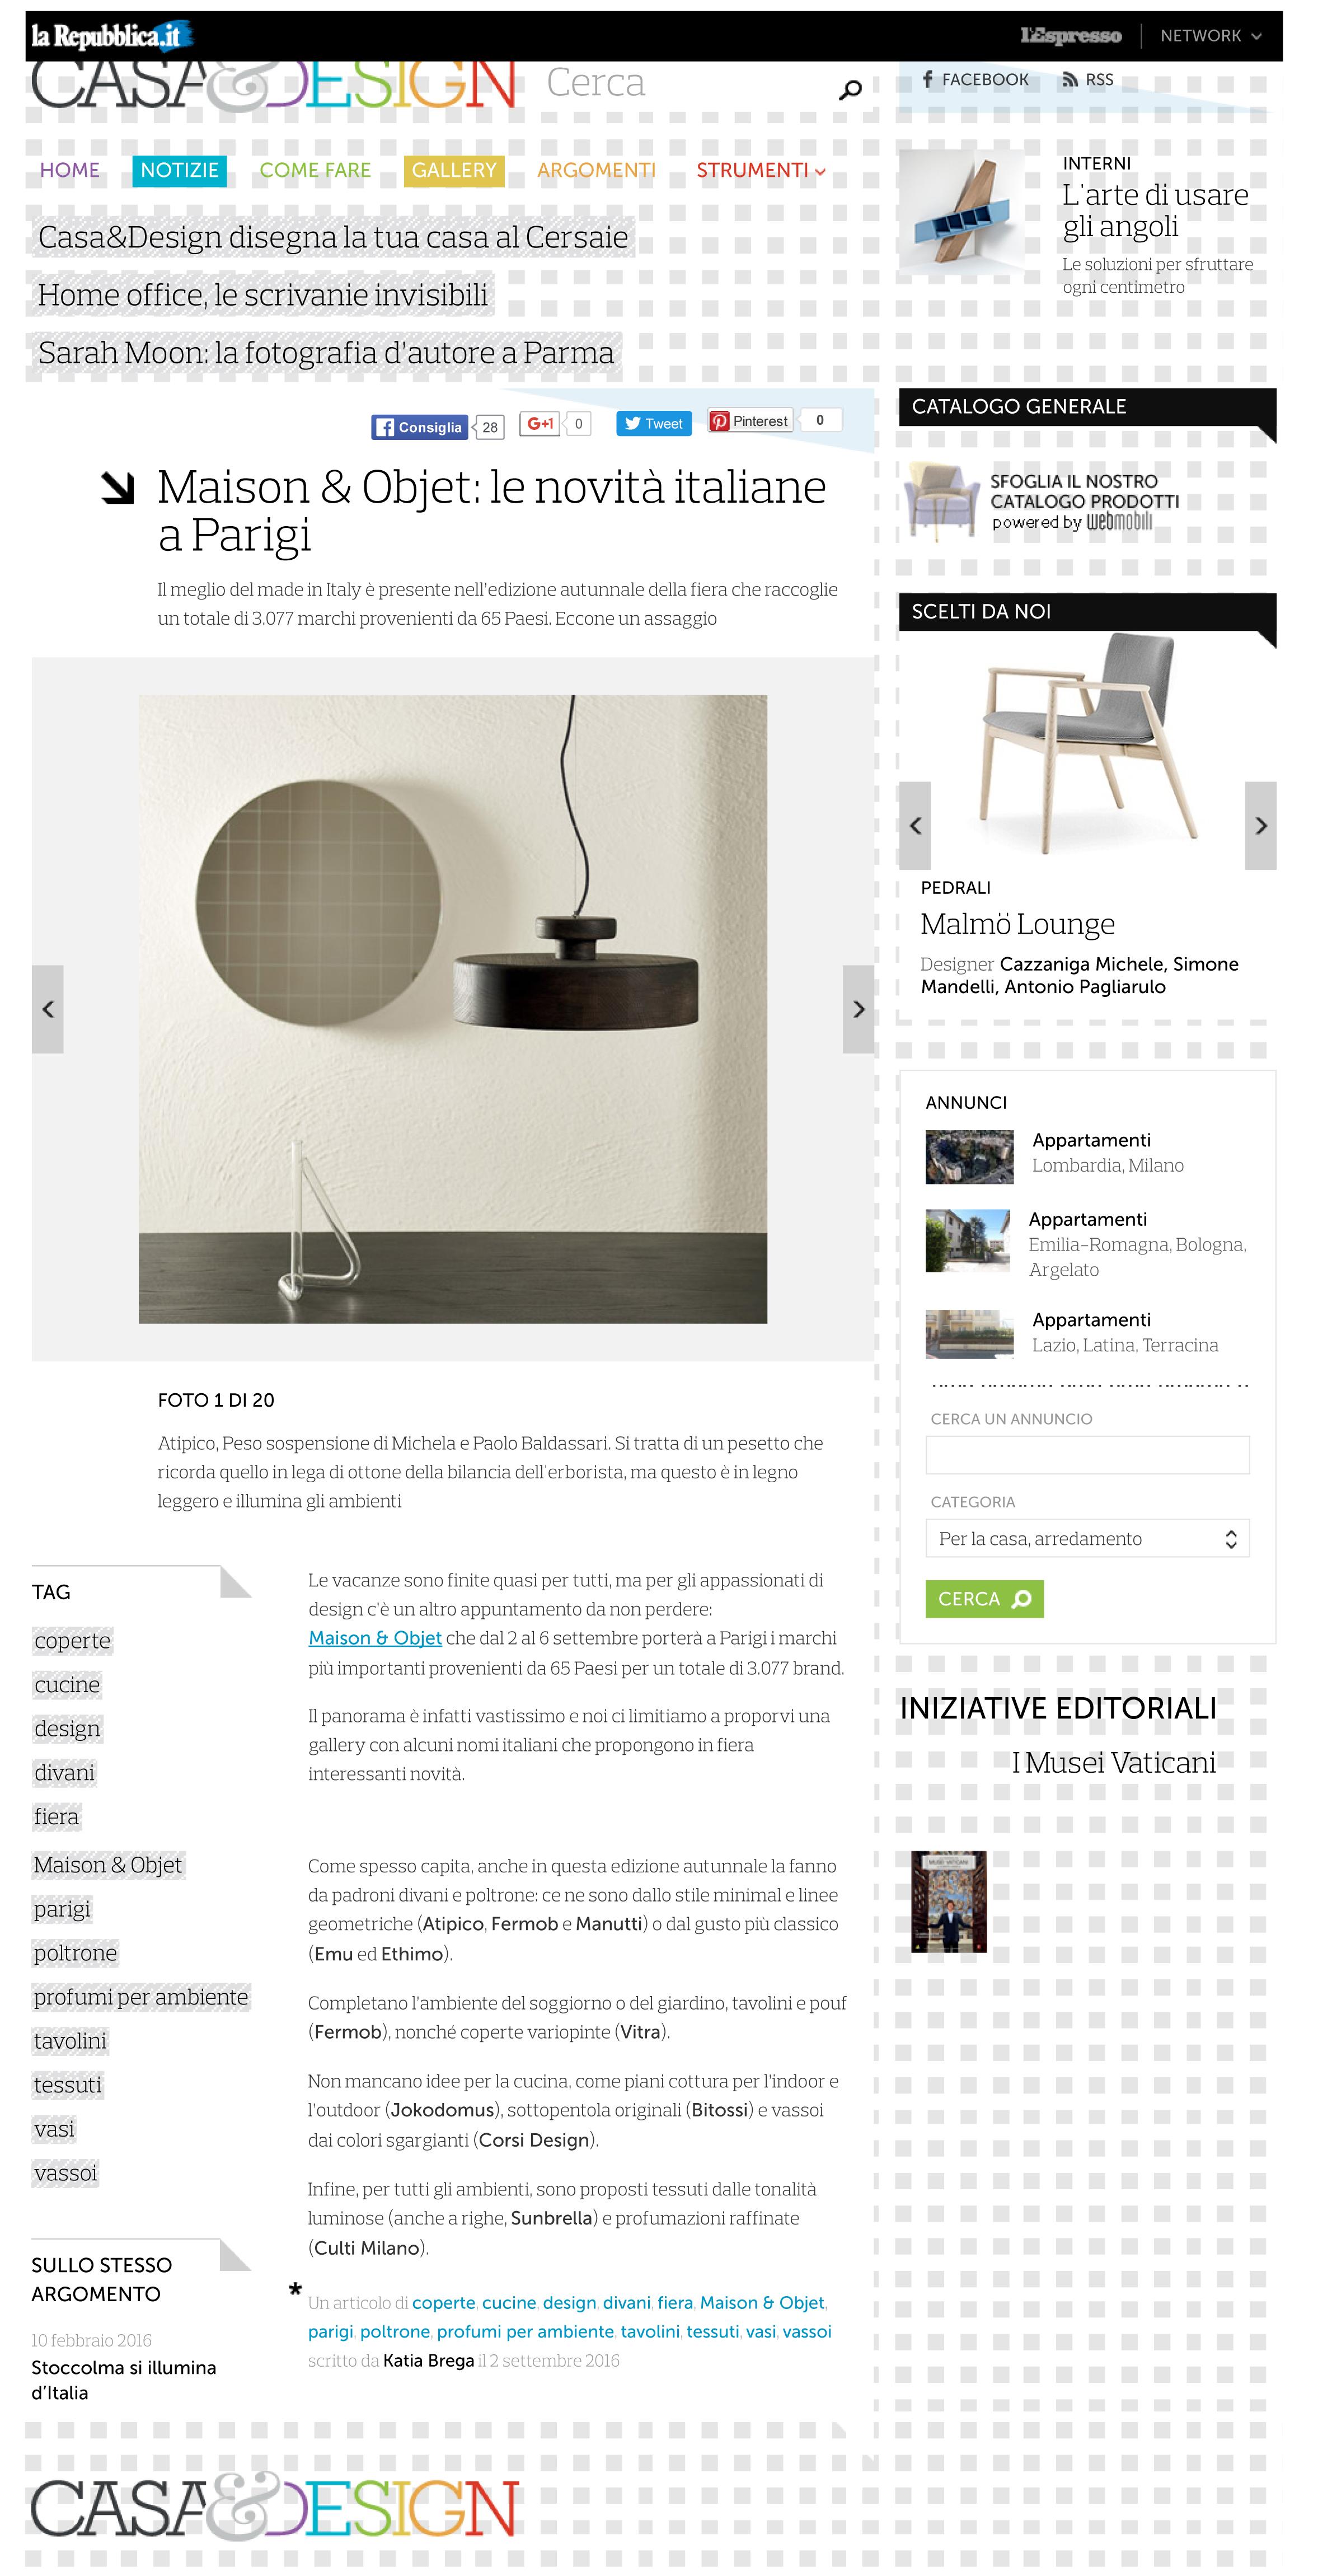 Maison & Objet_ le novità italiane a Parigi - Casa & Design-1